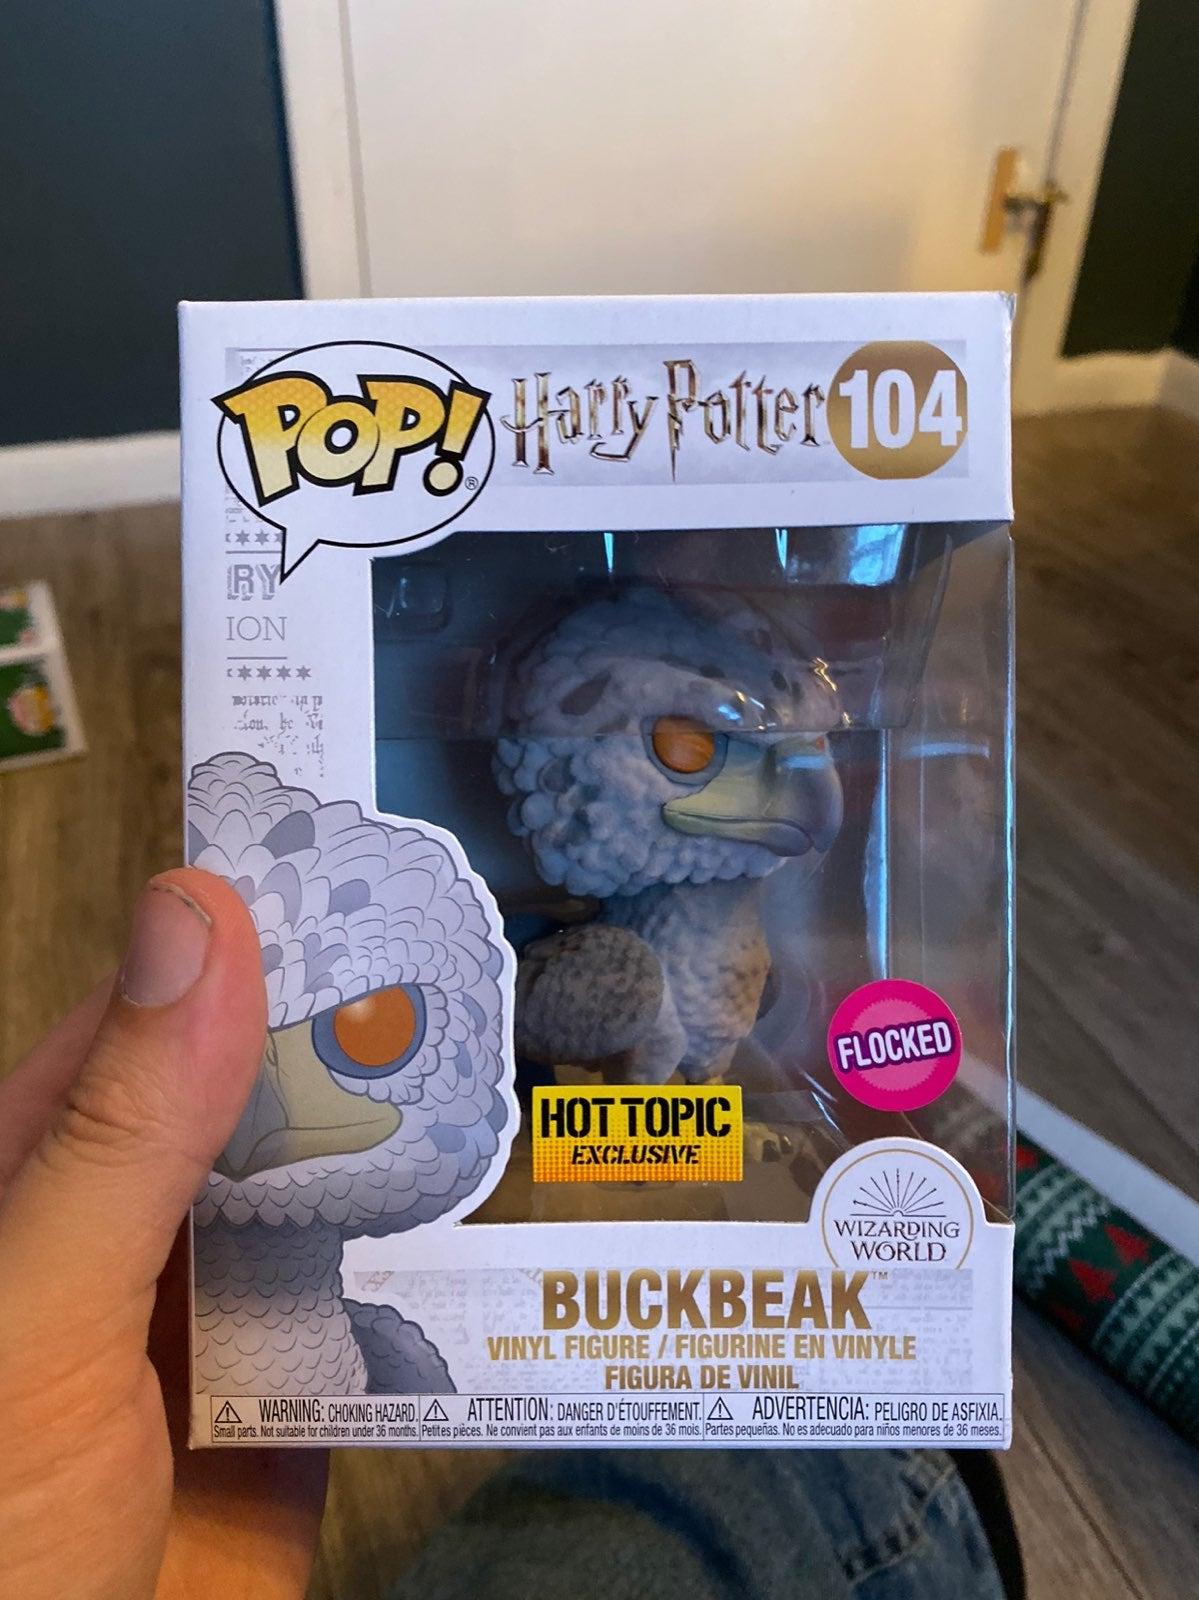 Buckbeak Funko Pop Figure!